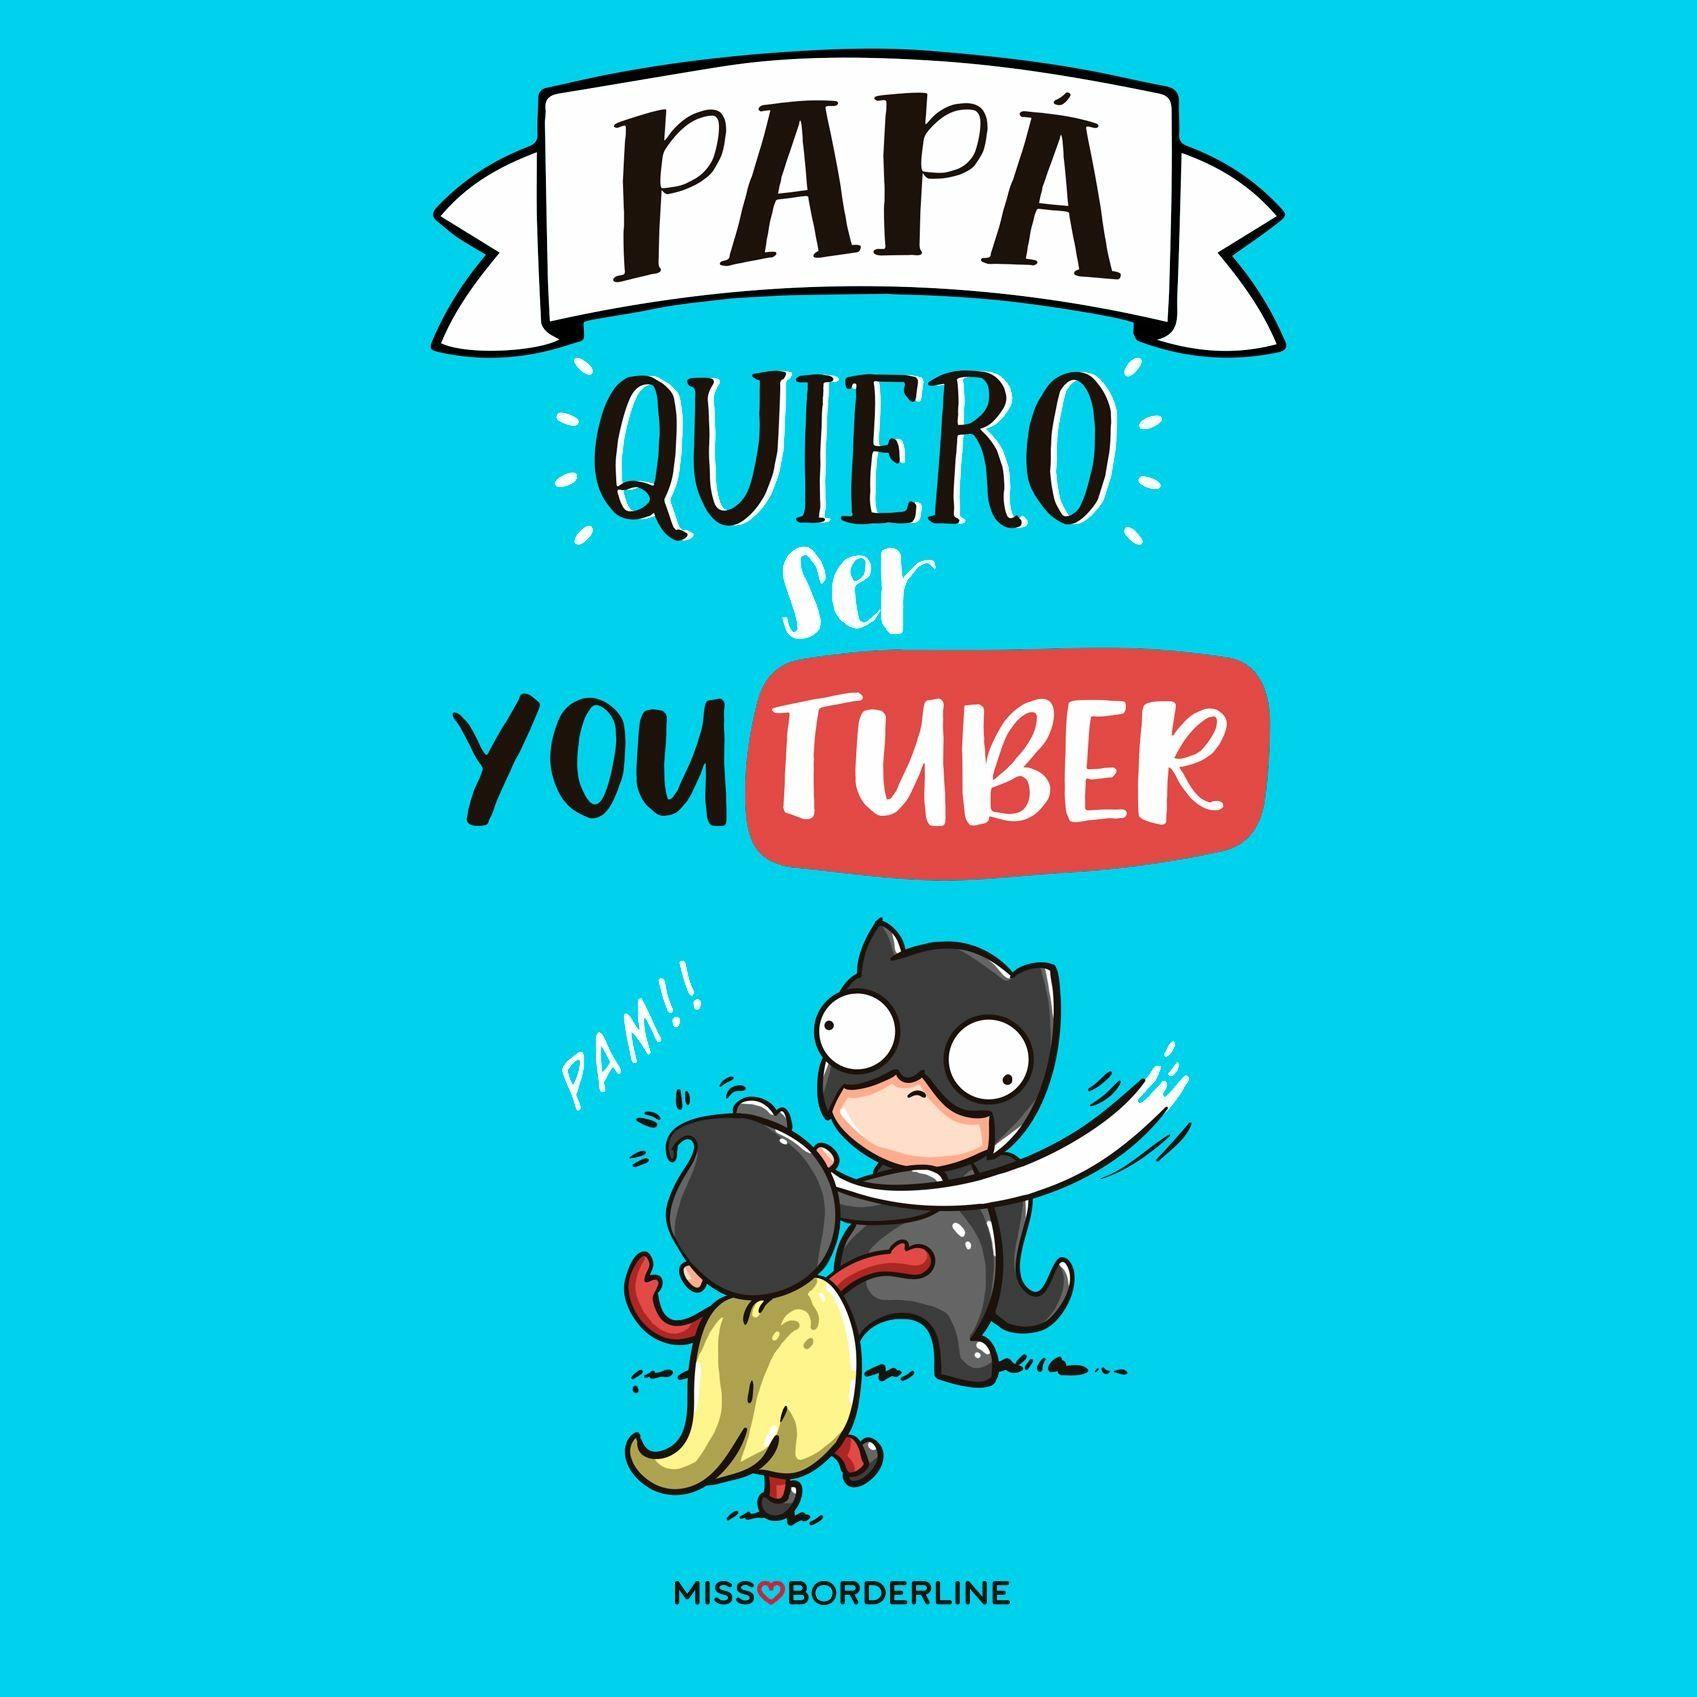 Papá quiero ser youtuber. PAM!! #youtuber #humor #frases #divertidas #graciosas #risas